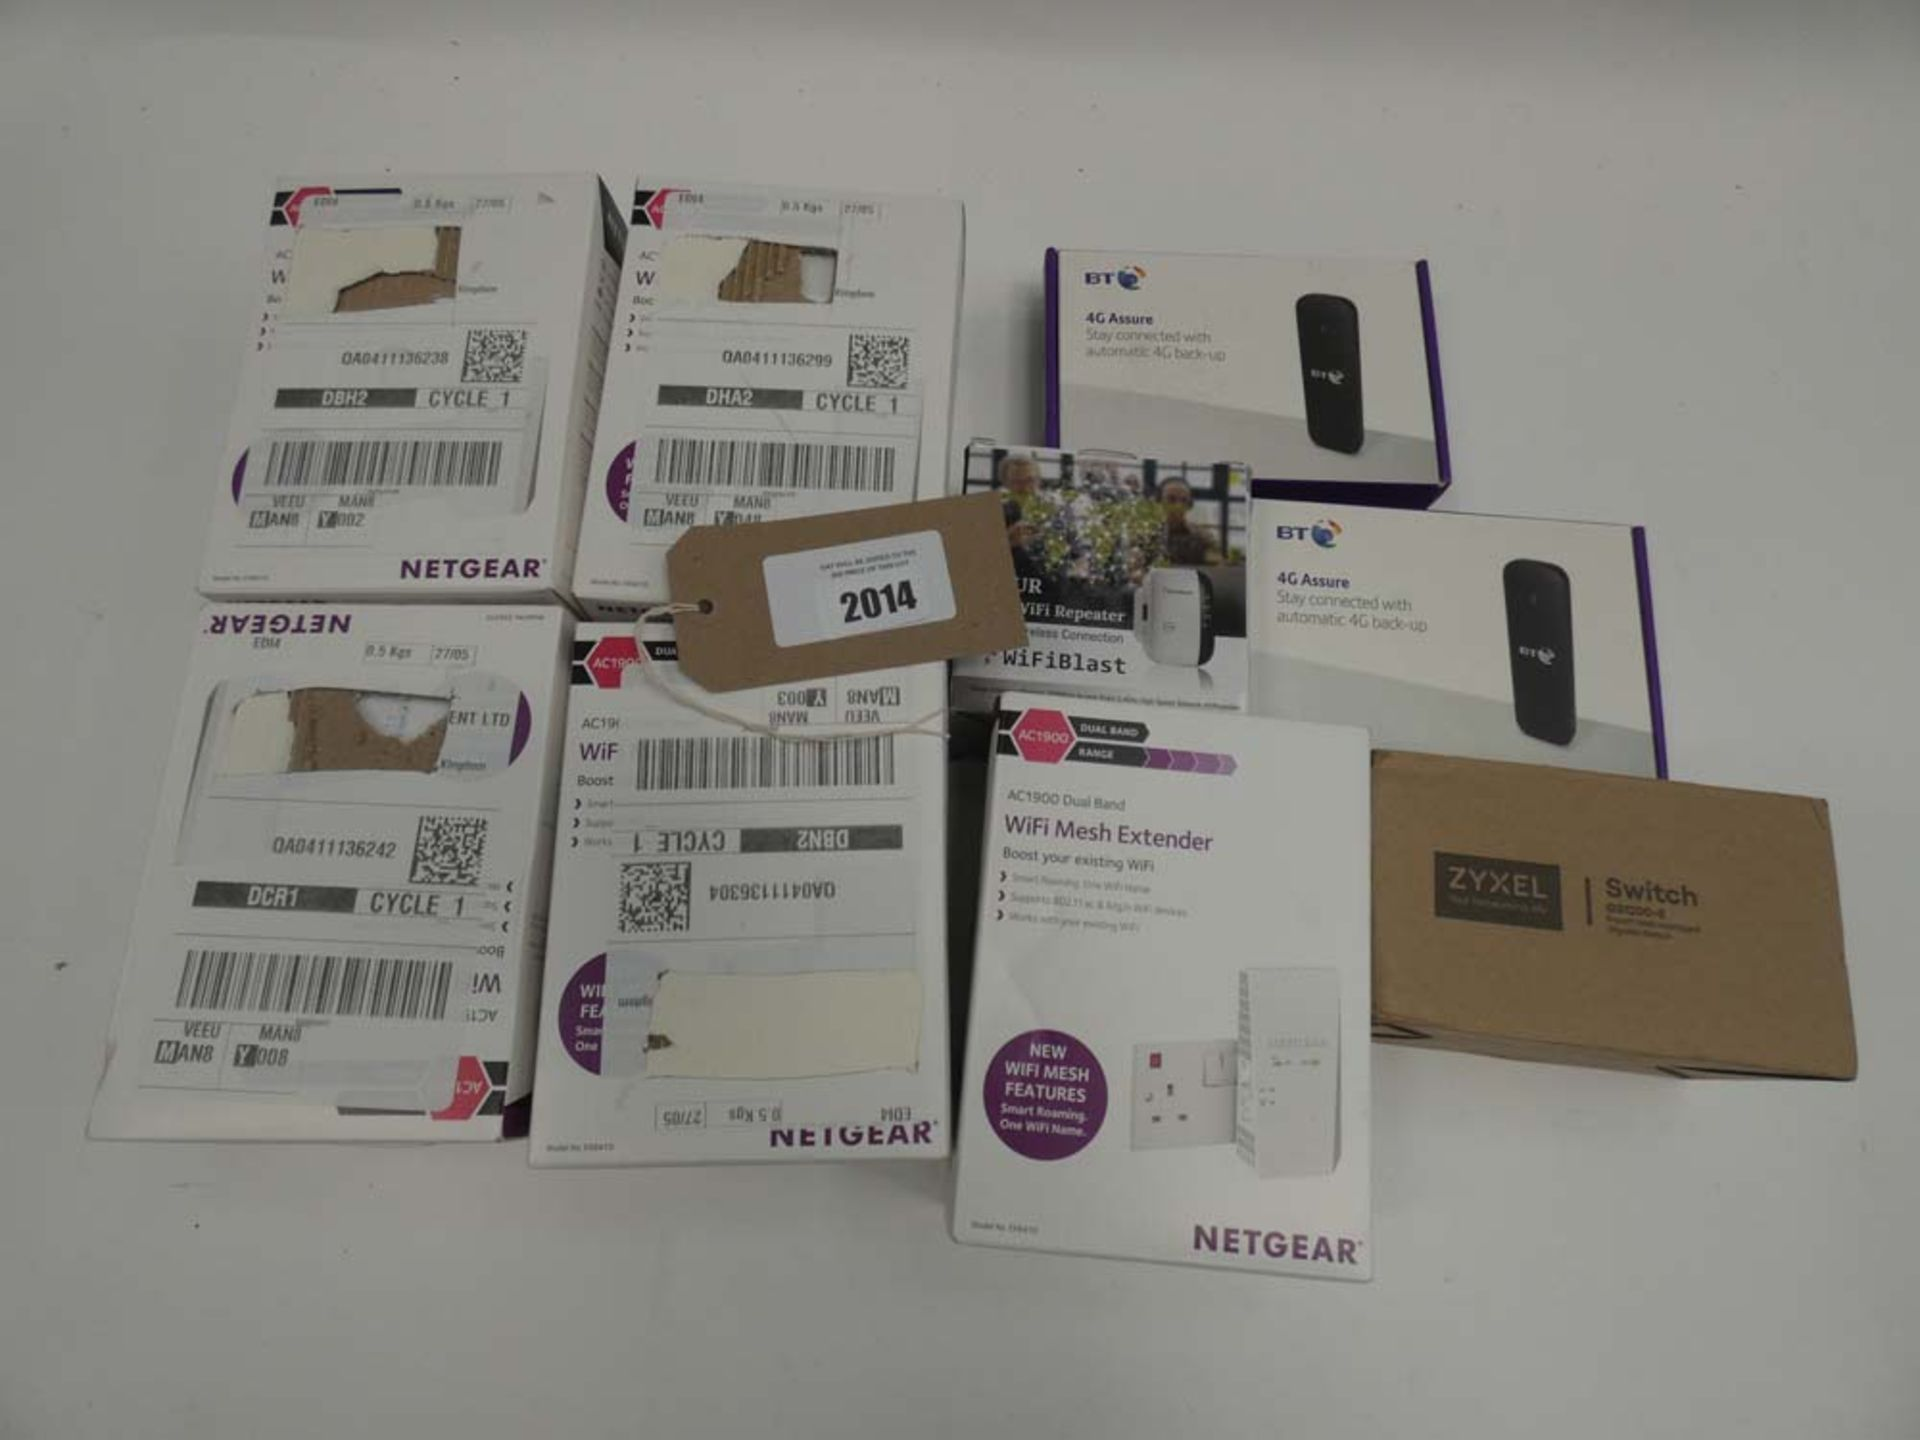 Lot 2014 - Bag containing Netgear AC1900 WiFi extenders, BT 4G Assure dongles, Zyxel Switch etc